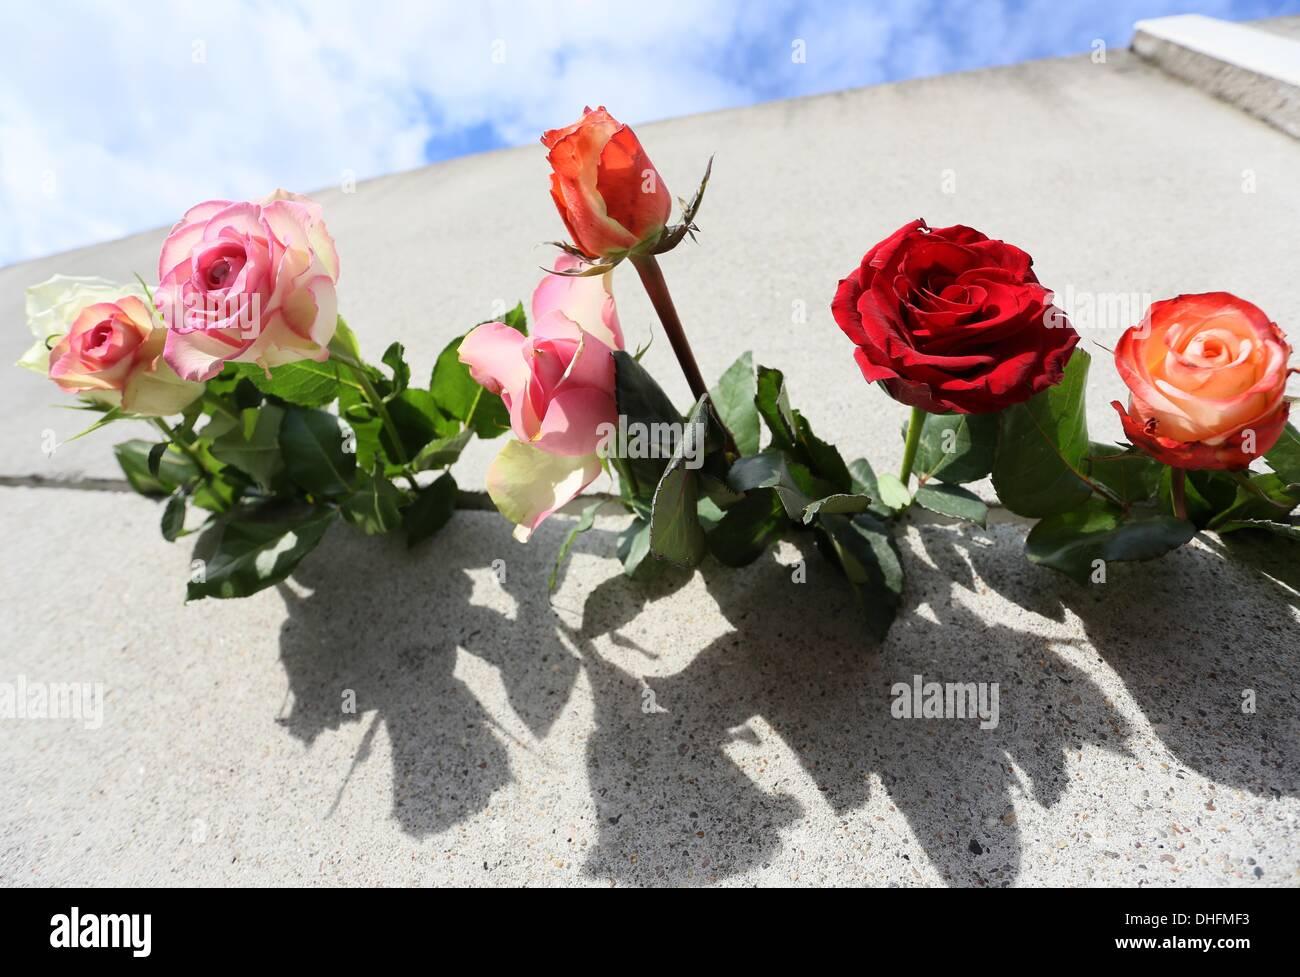 Berlin, Germany. 09th Nov, 2013. Roses stuck in a gap of the memorial of the Berlin Wall in Berlin, Germany, 09 November 2013. Photo: STEPHANIE PILICK/dpa/Alamy Live News - Stock Image